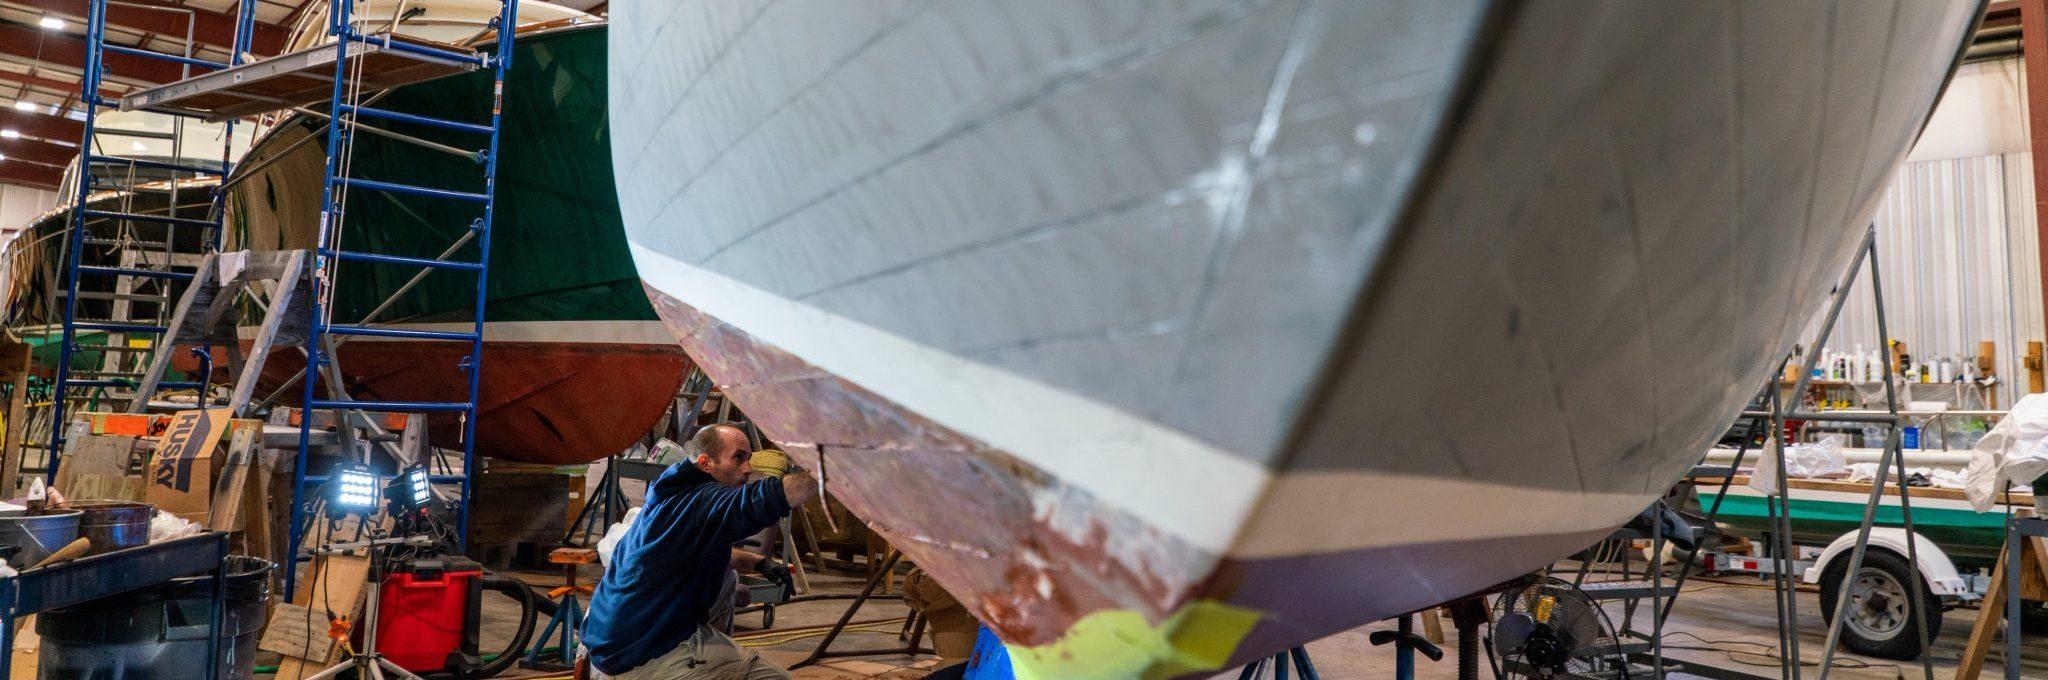 Crosby Yacht Service